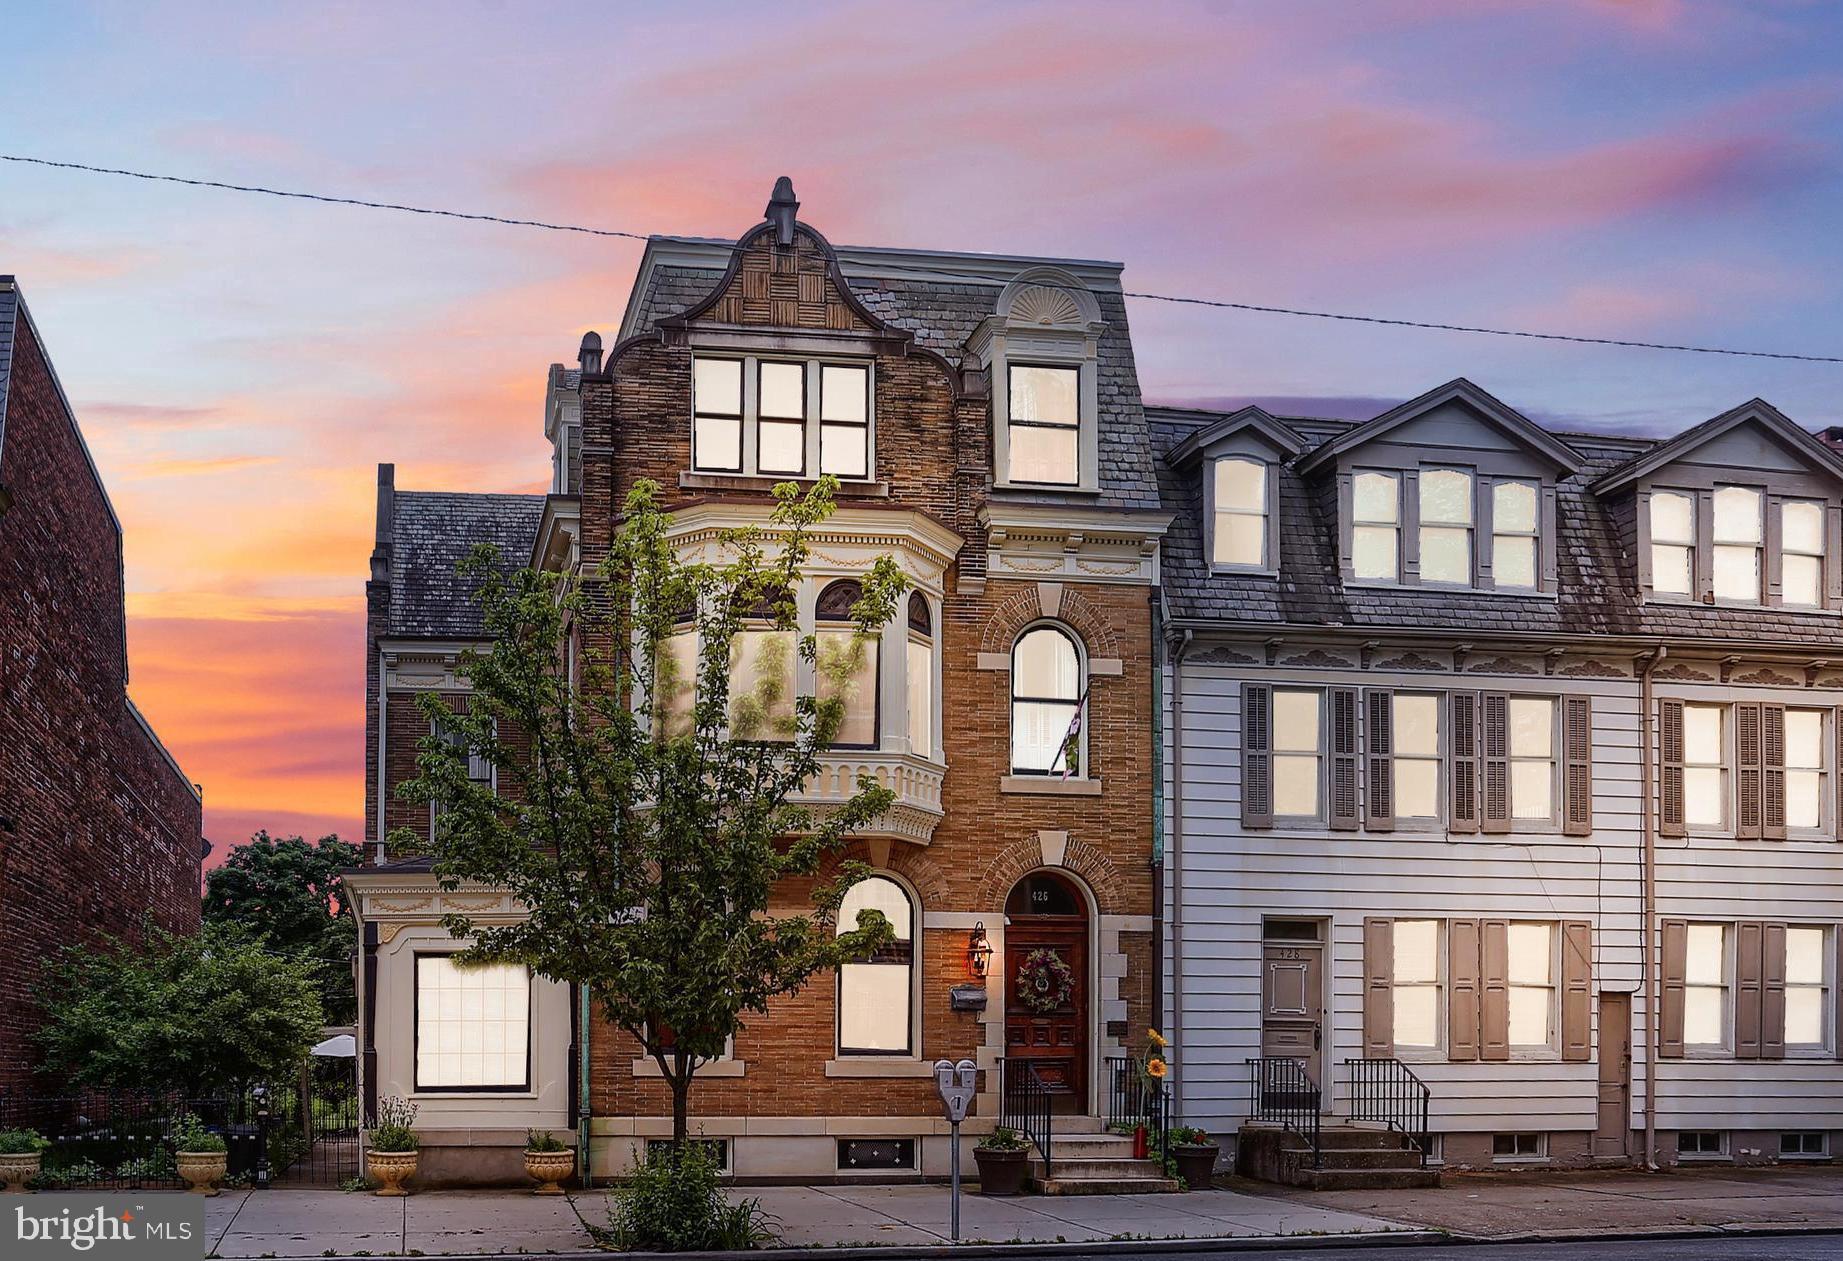 426 W Market Street, York, PA 17401